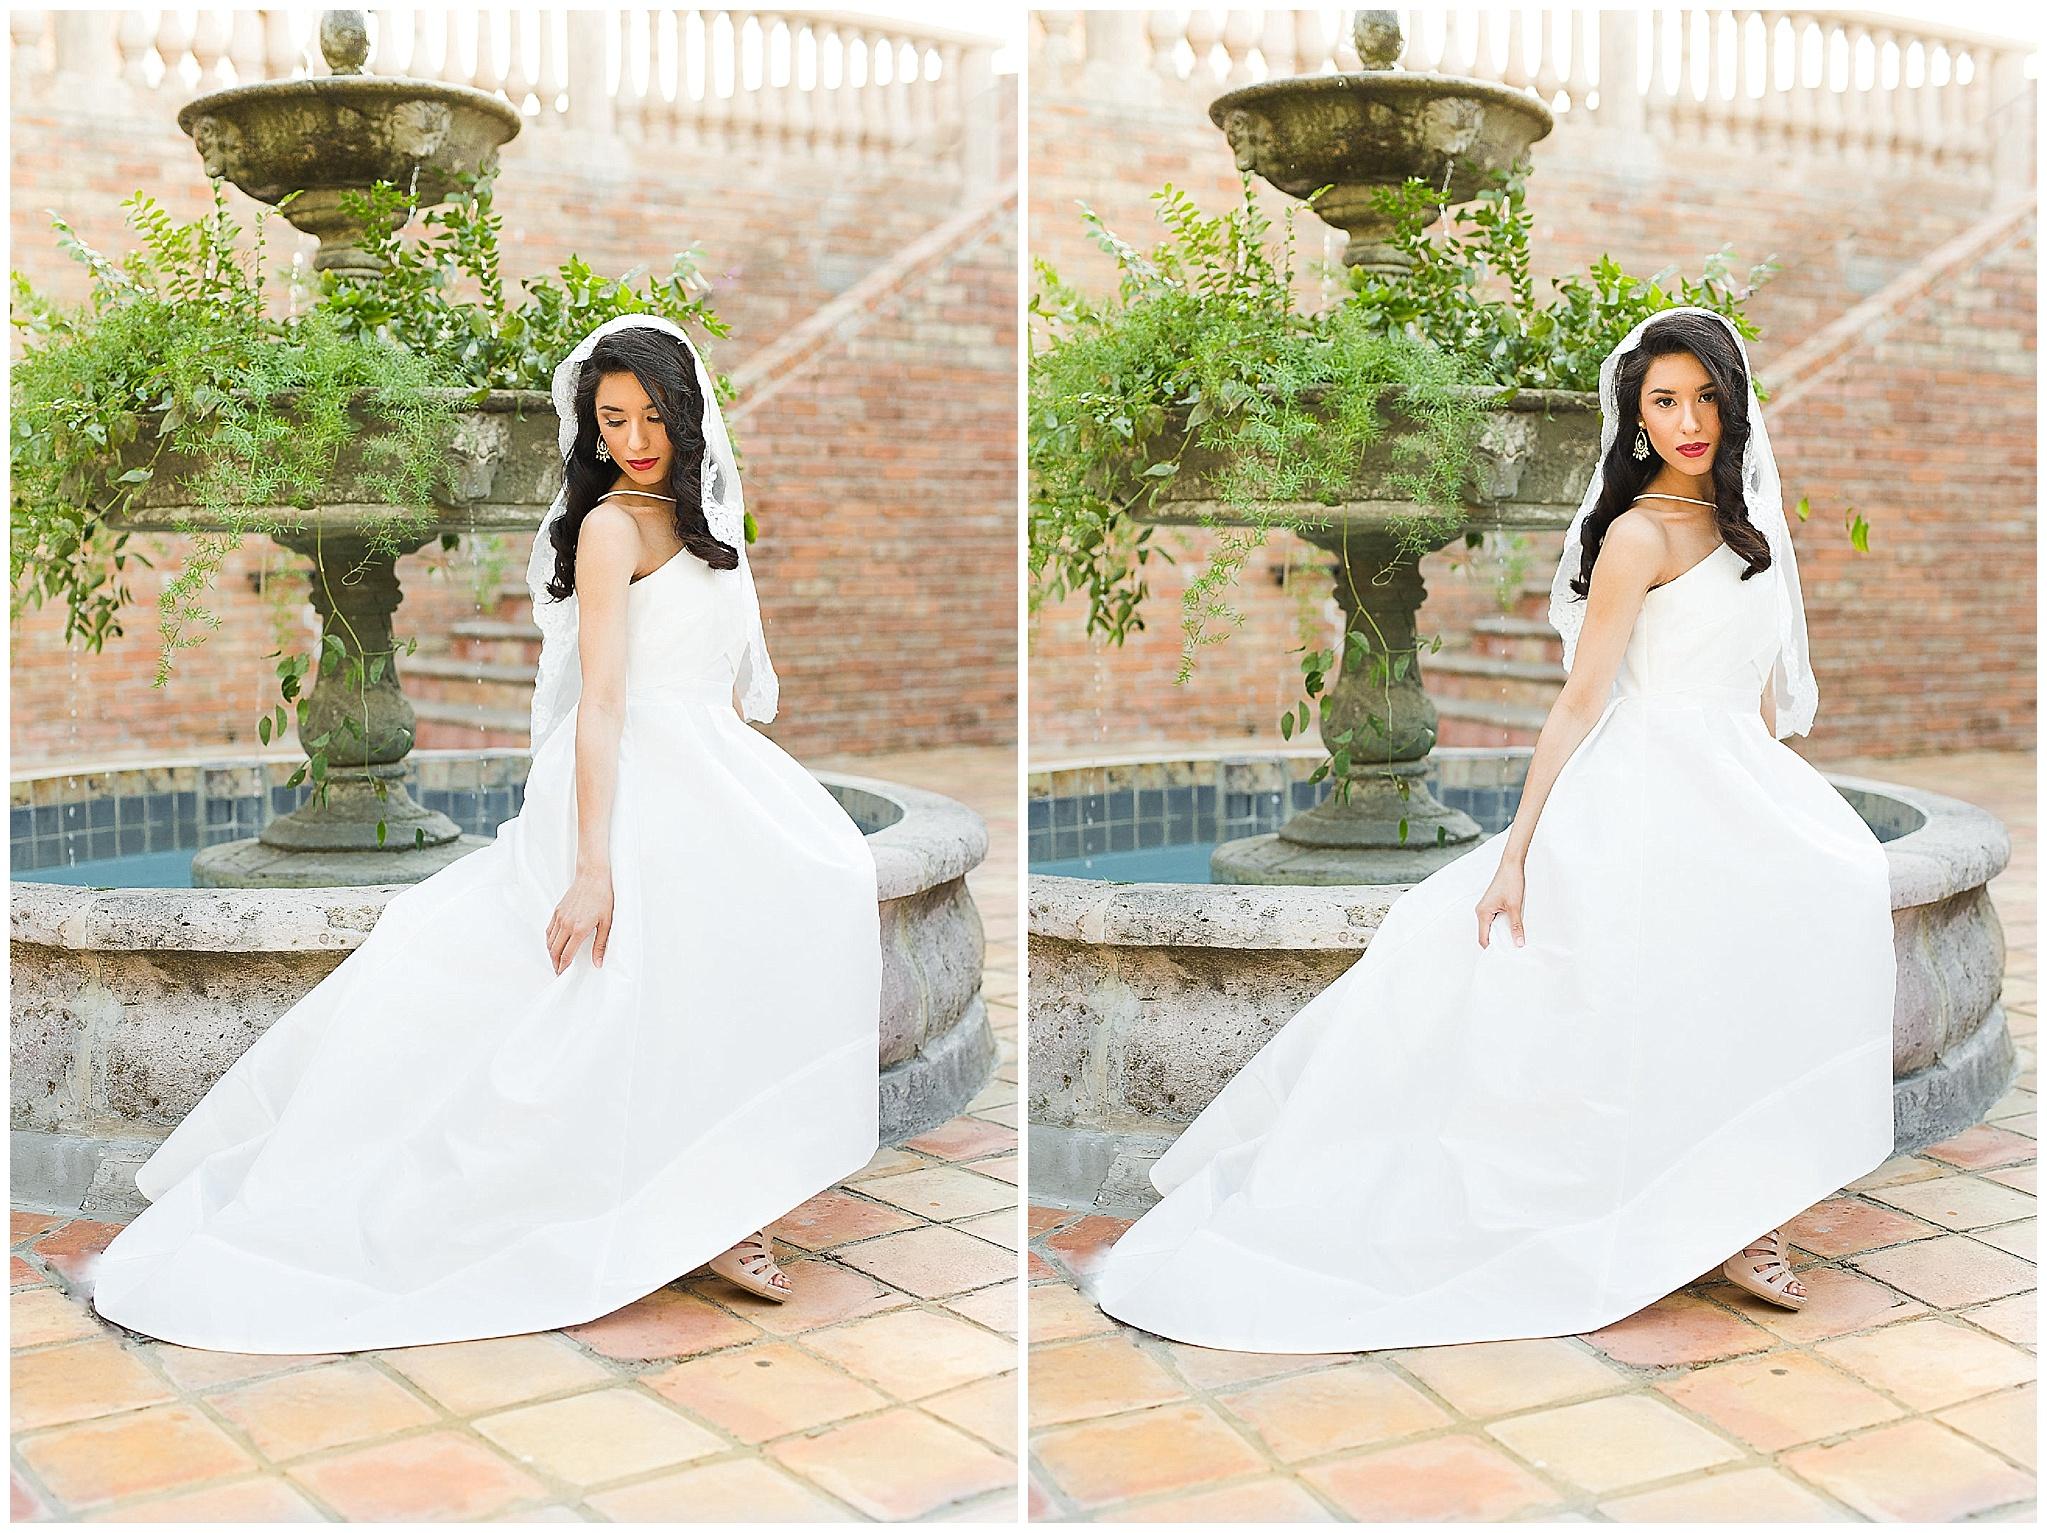 wedding-inspiration-houston-texas-bride-blog_0020.jpg